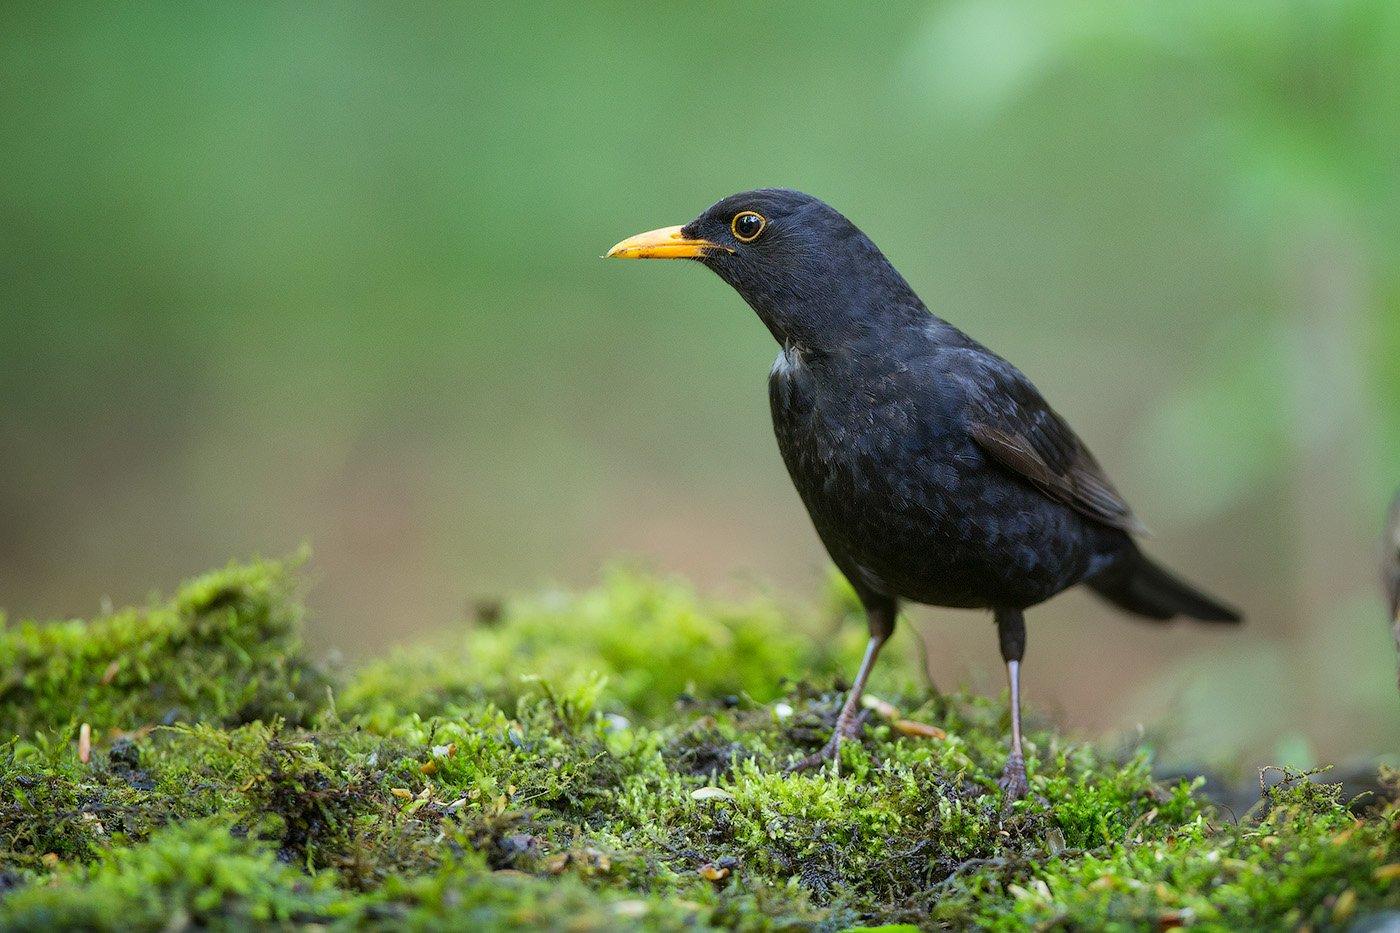 blackbird, bird, wildlife, черный дрозд, птицы, птица, дикая природа, дрозд, Голубев Дмитрий